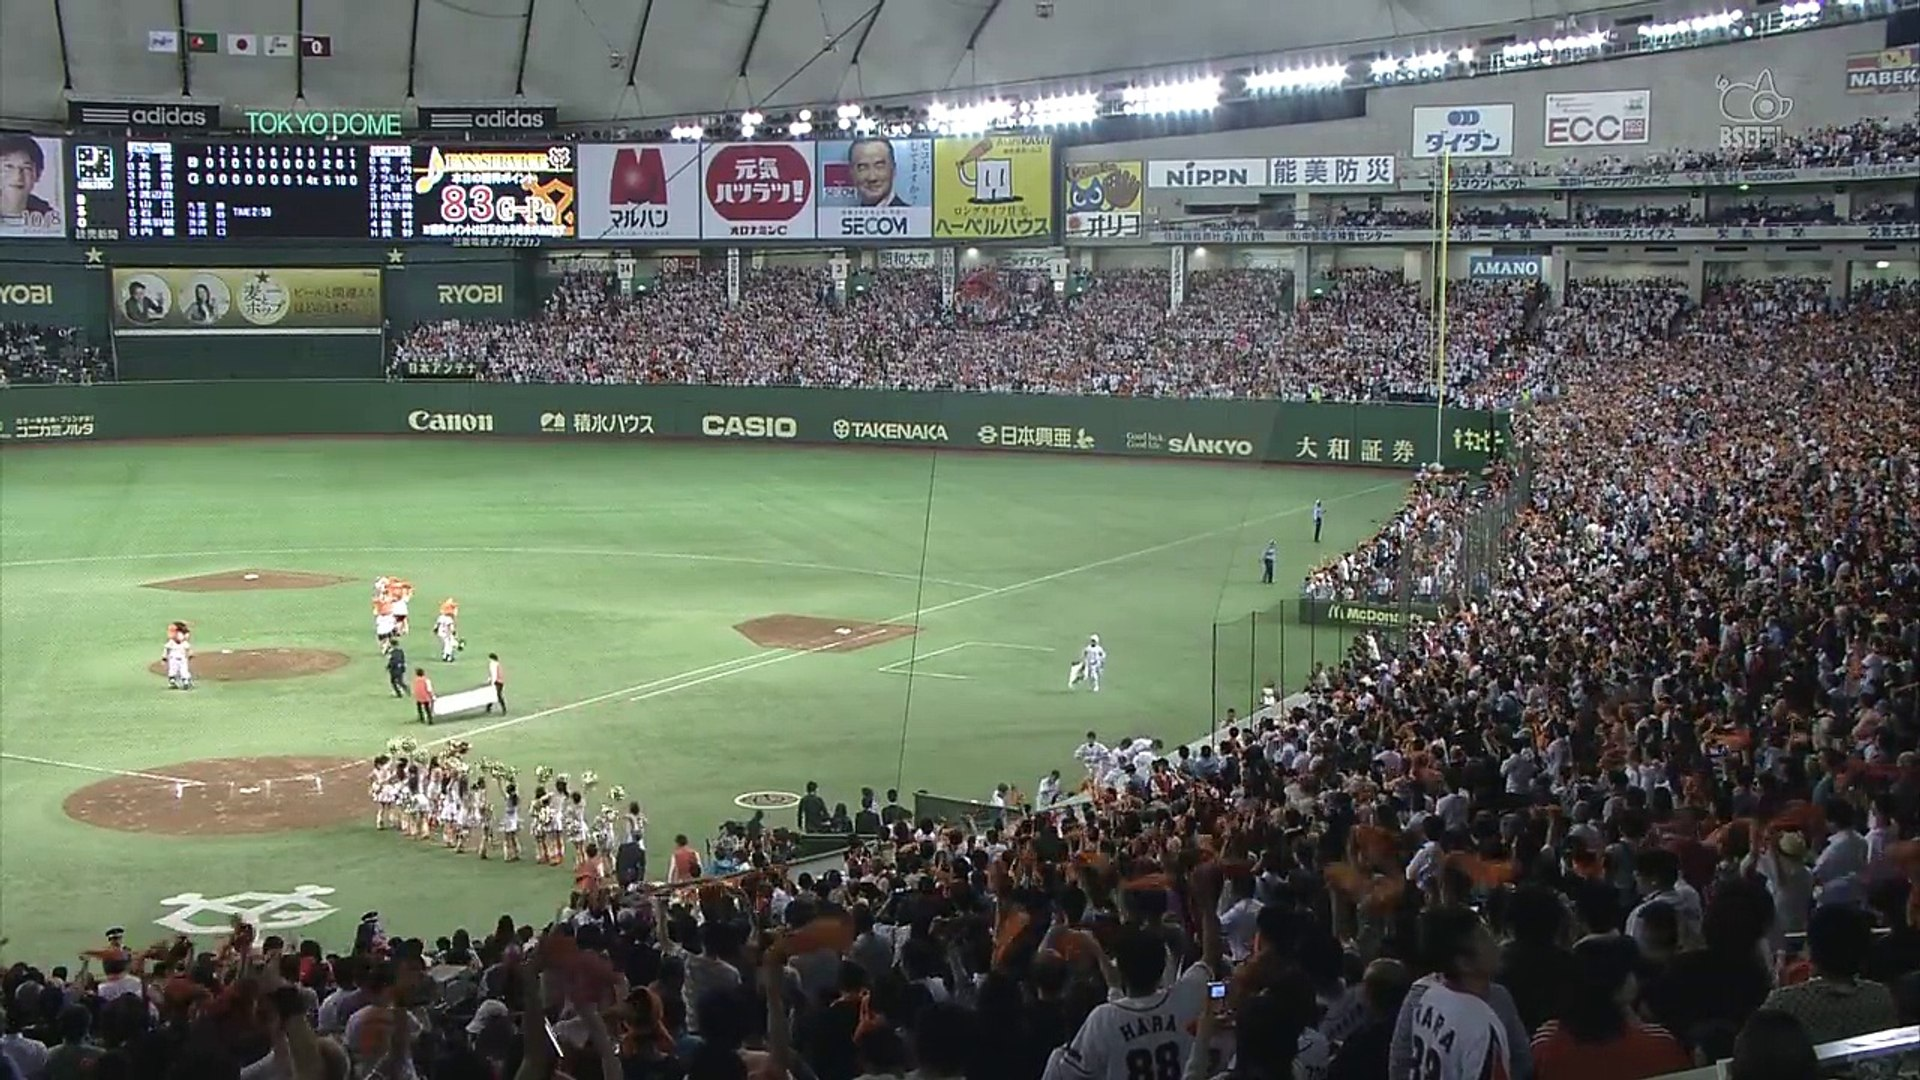 new.10.22 長野久義 代打逆転サヨナラ満塁ホームラン 【巨人vs横浜 最終戦】